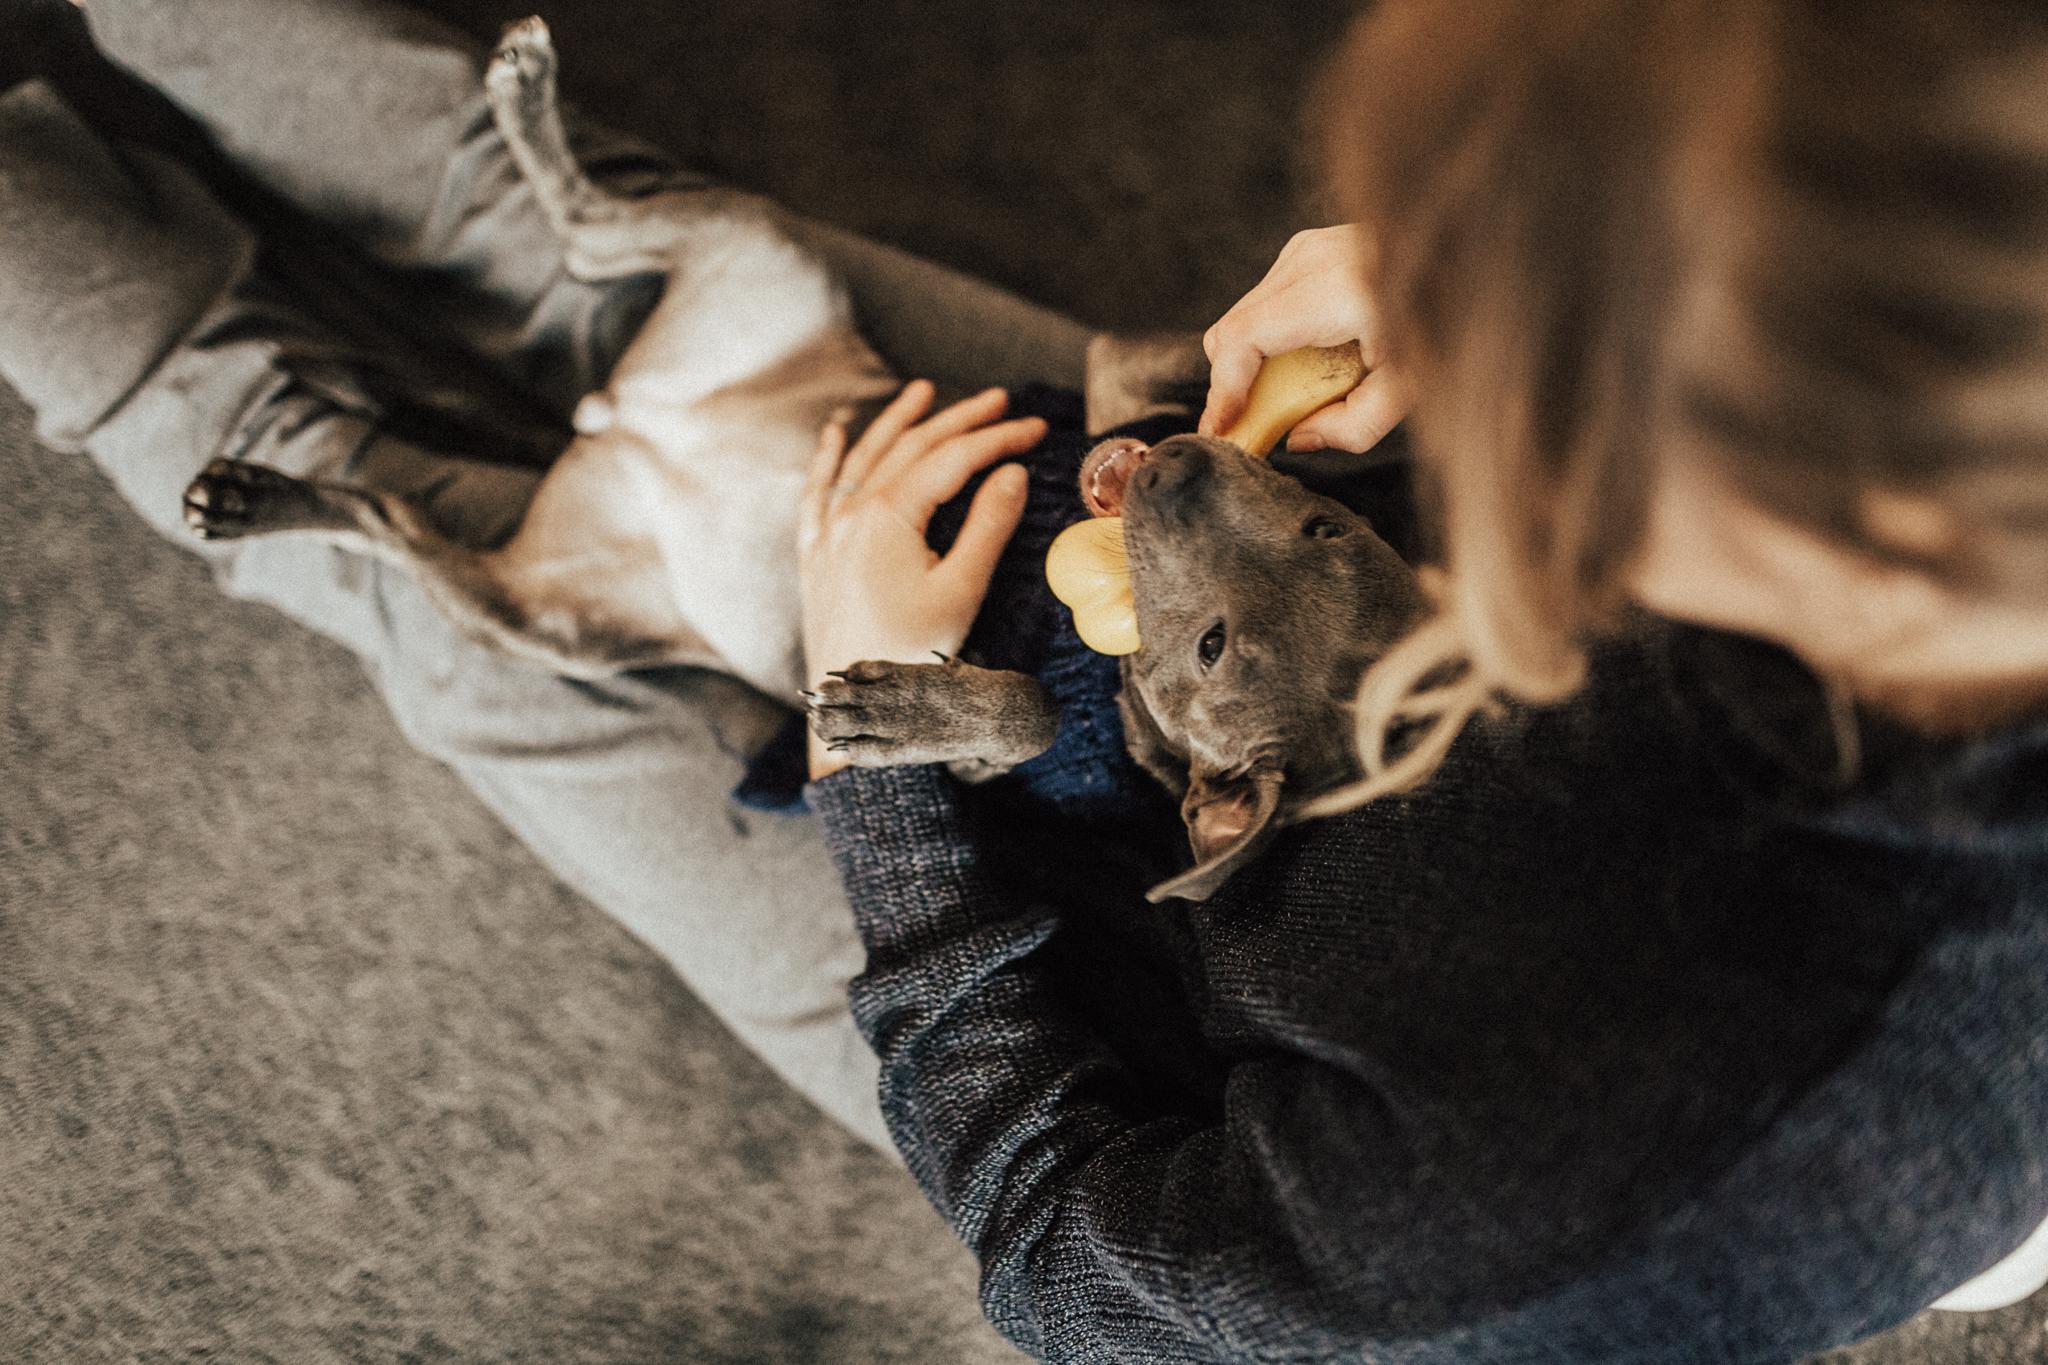 Dog-Human-Session-Photography-Darina-Stoda-Animal-Indigo-11.jpg